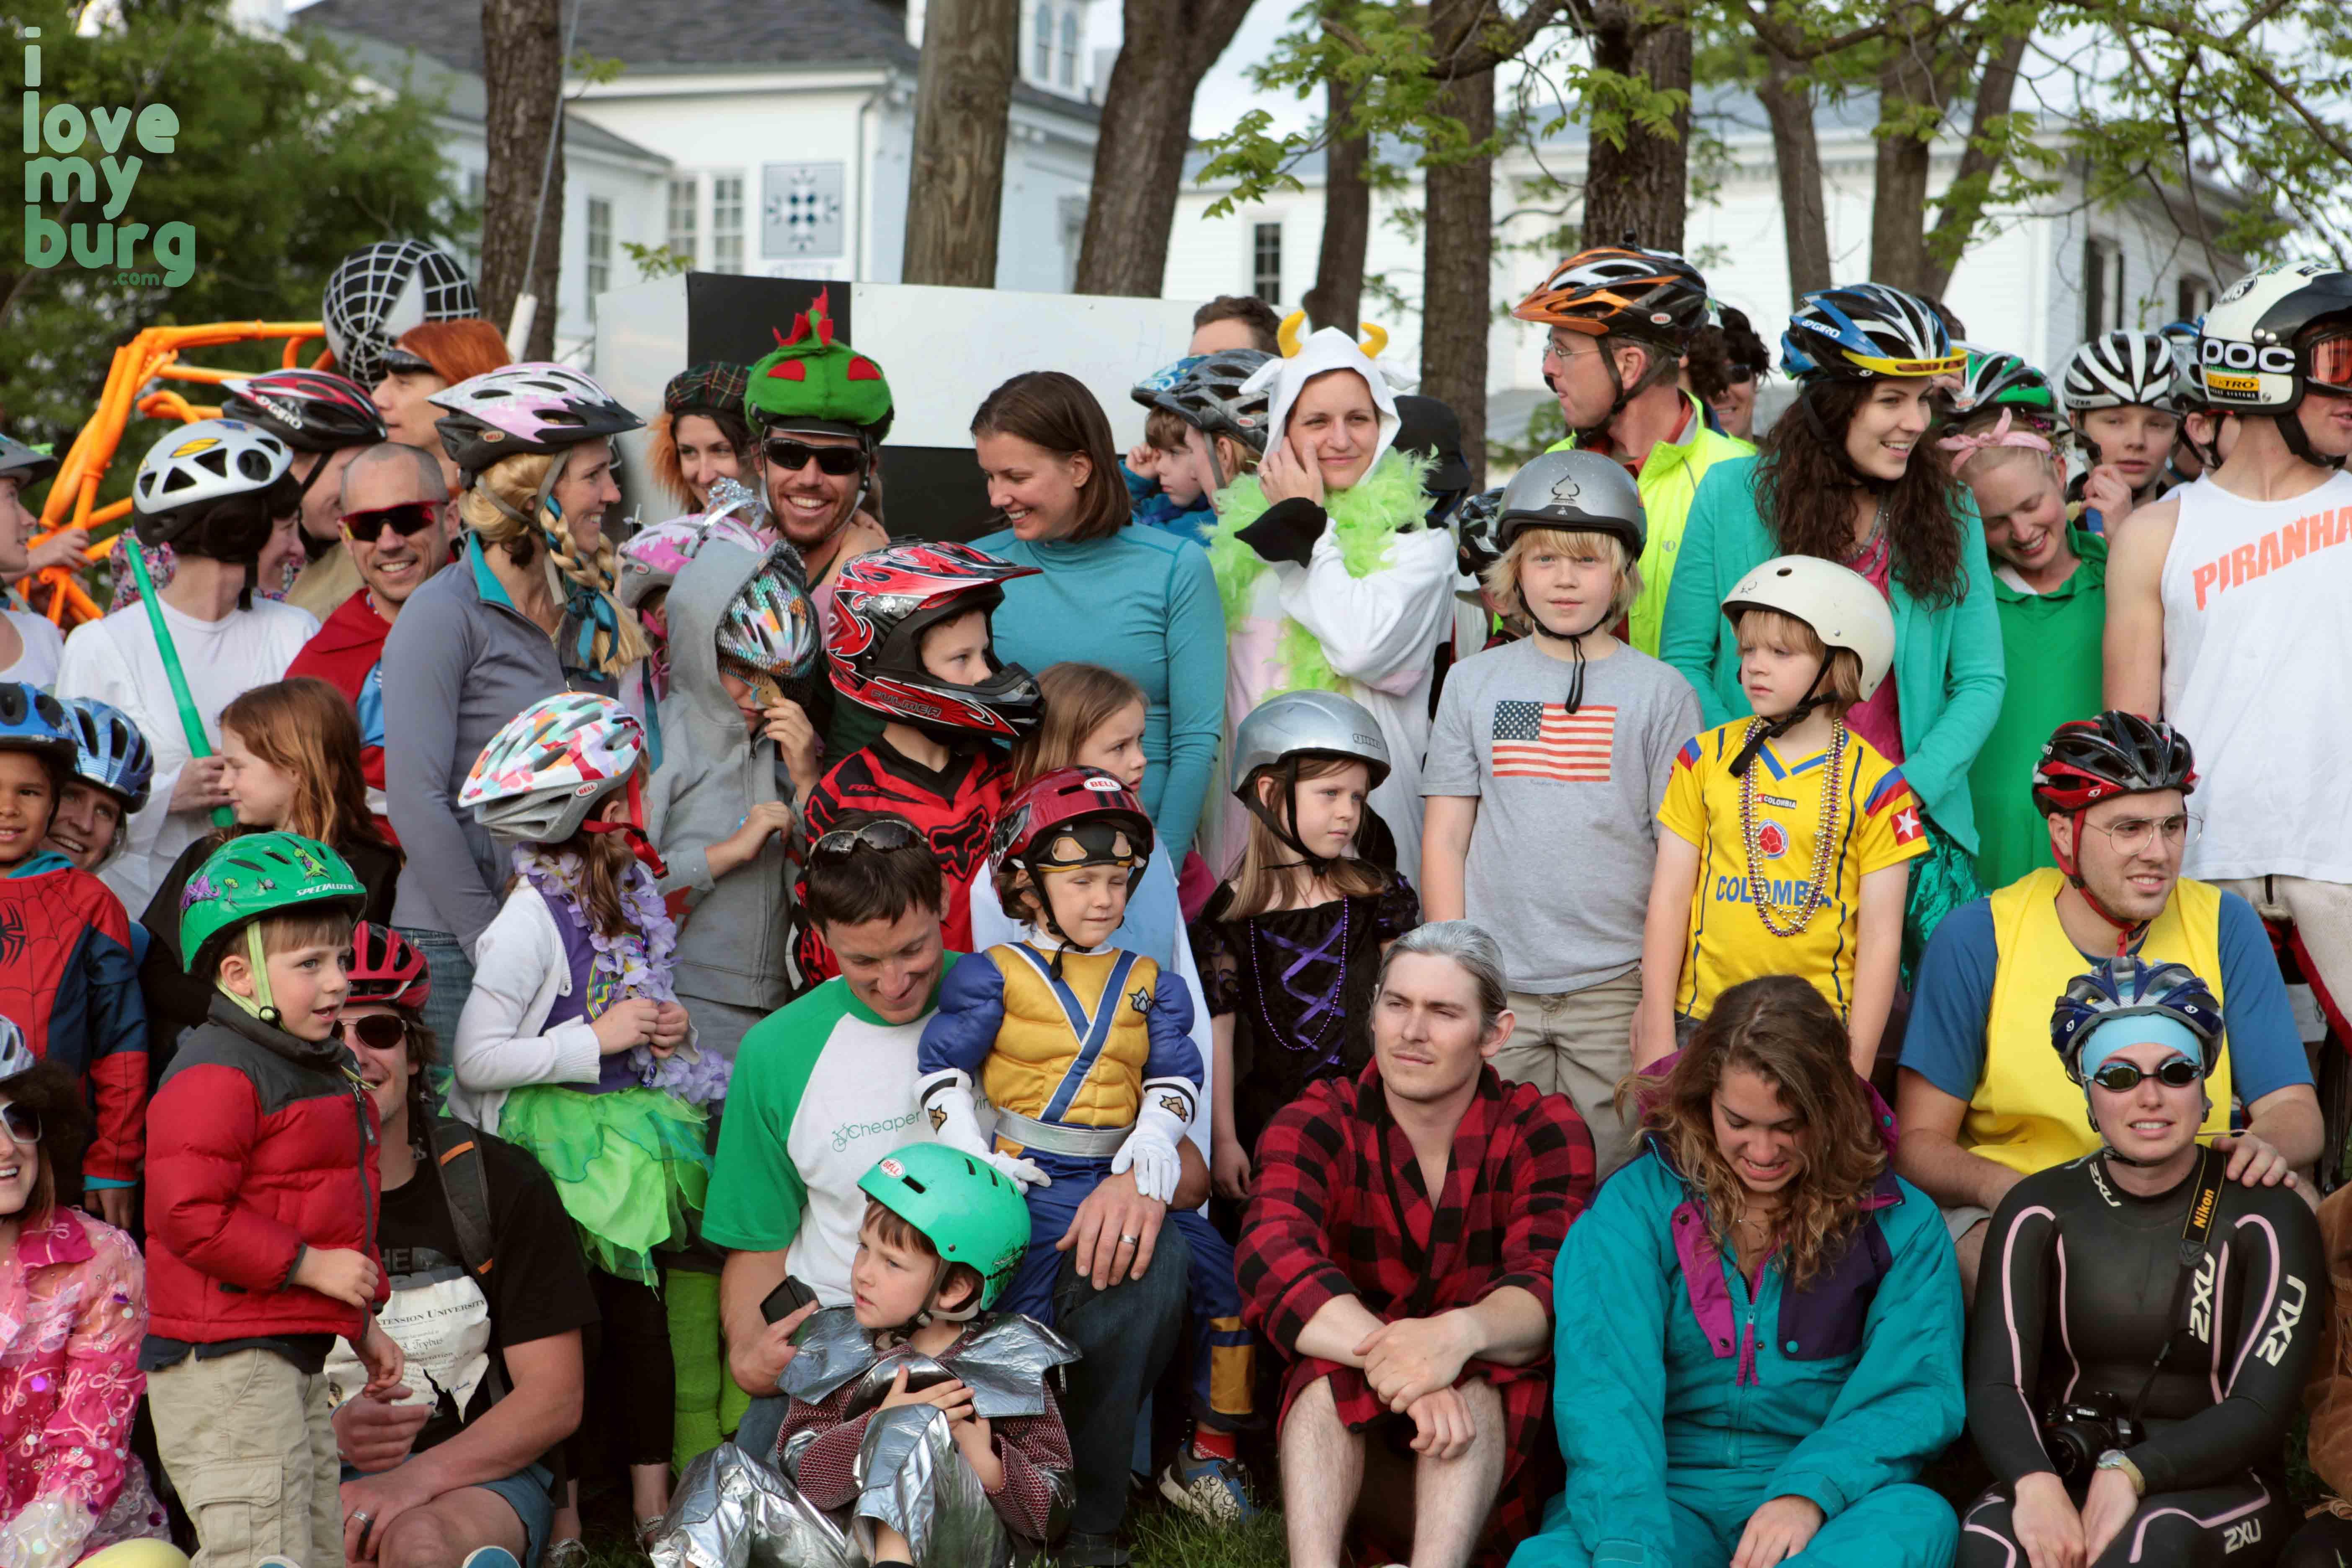 Bike Parade group 2